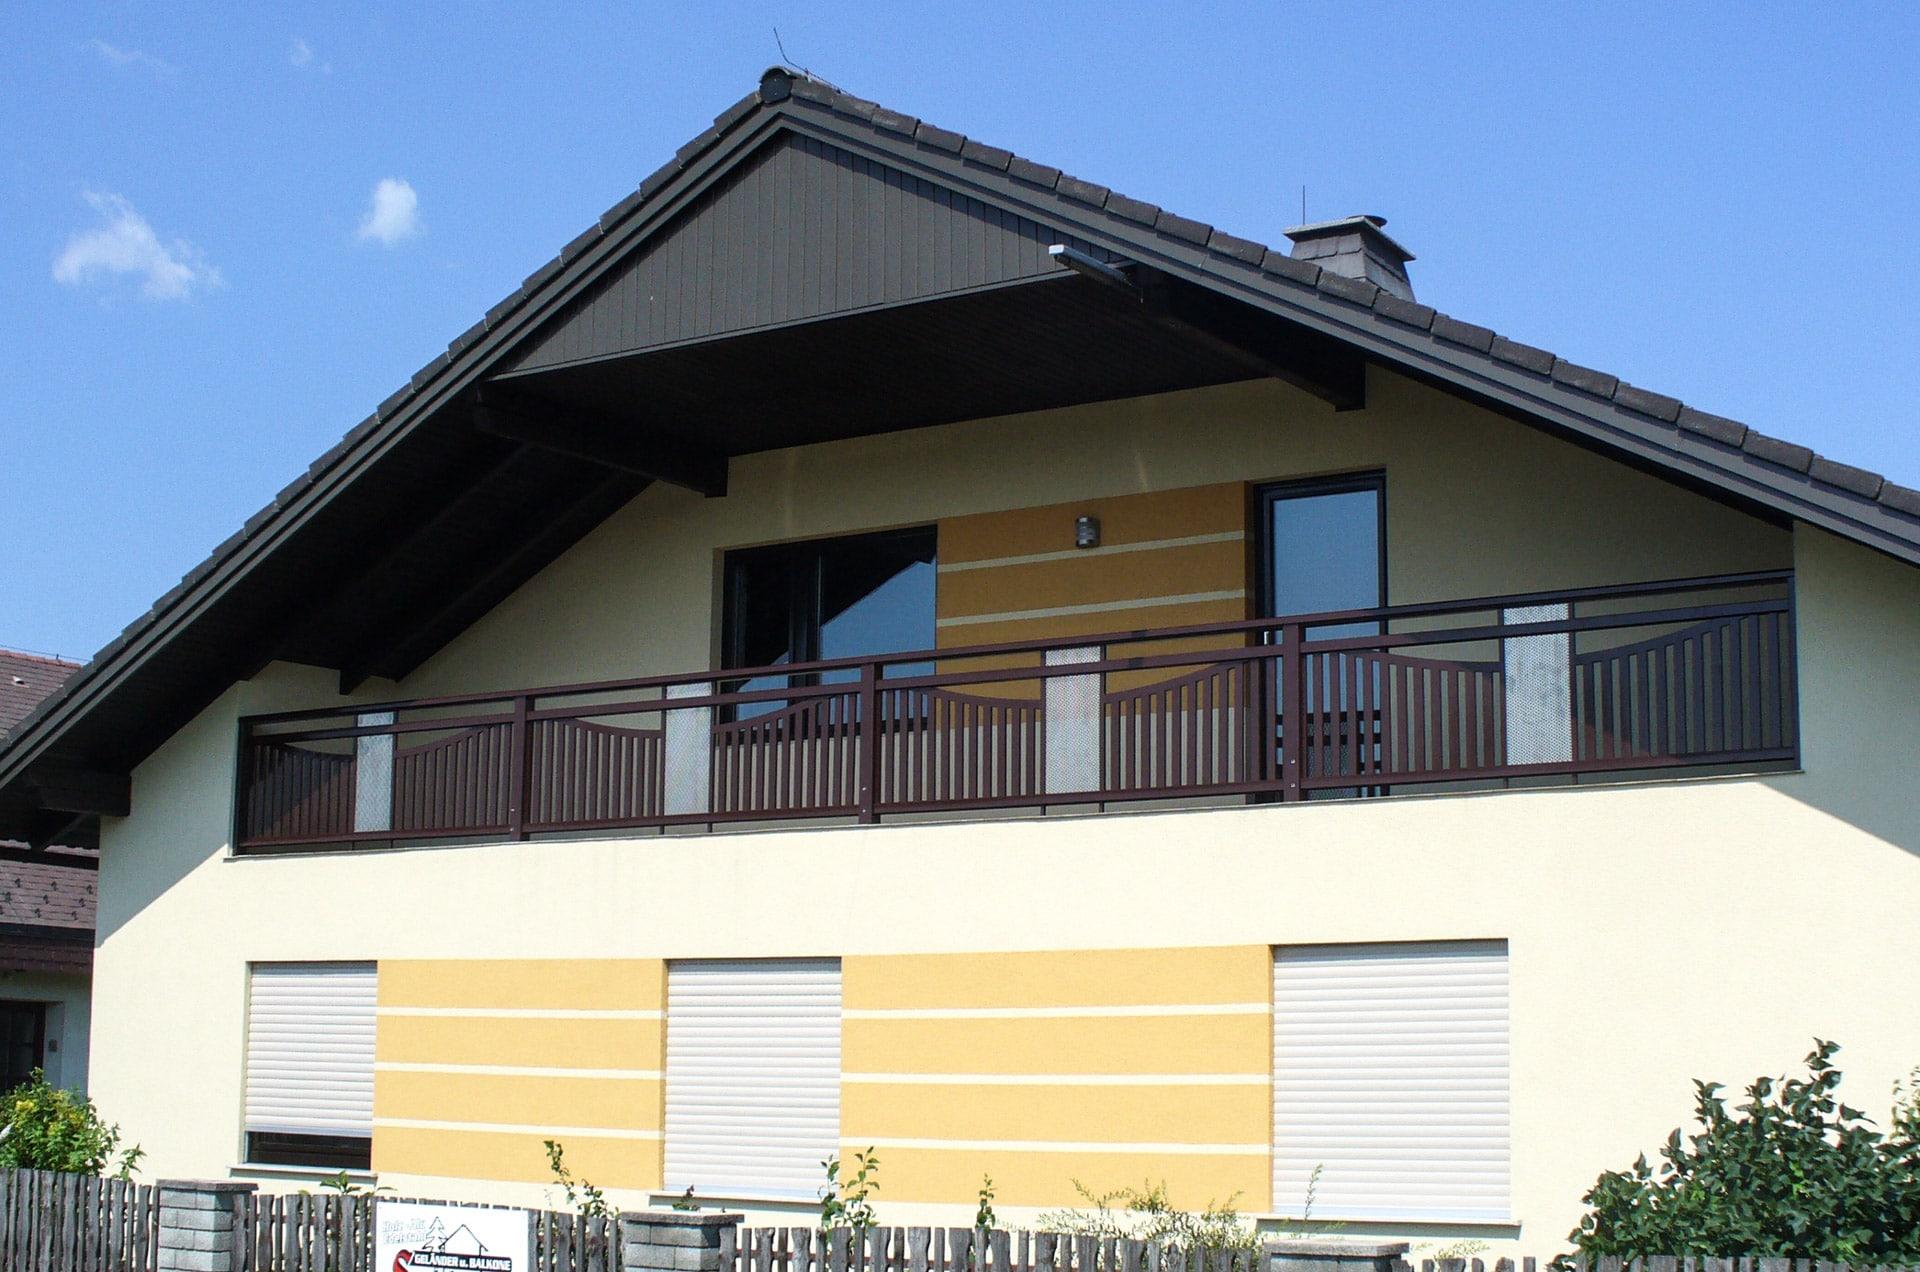 Stockerau 04 a | brauner Alubalkon mit vertikaler Lattenfüllung und Lochblech grau mittig | Svoboda